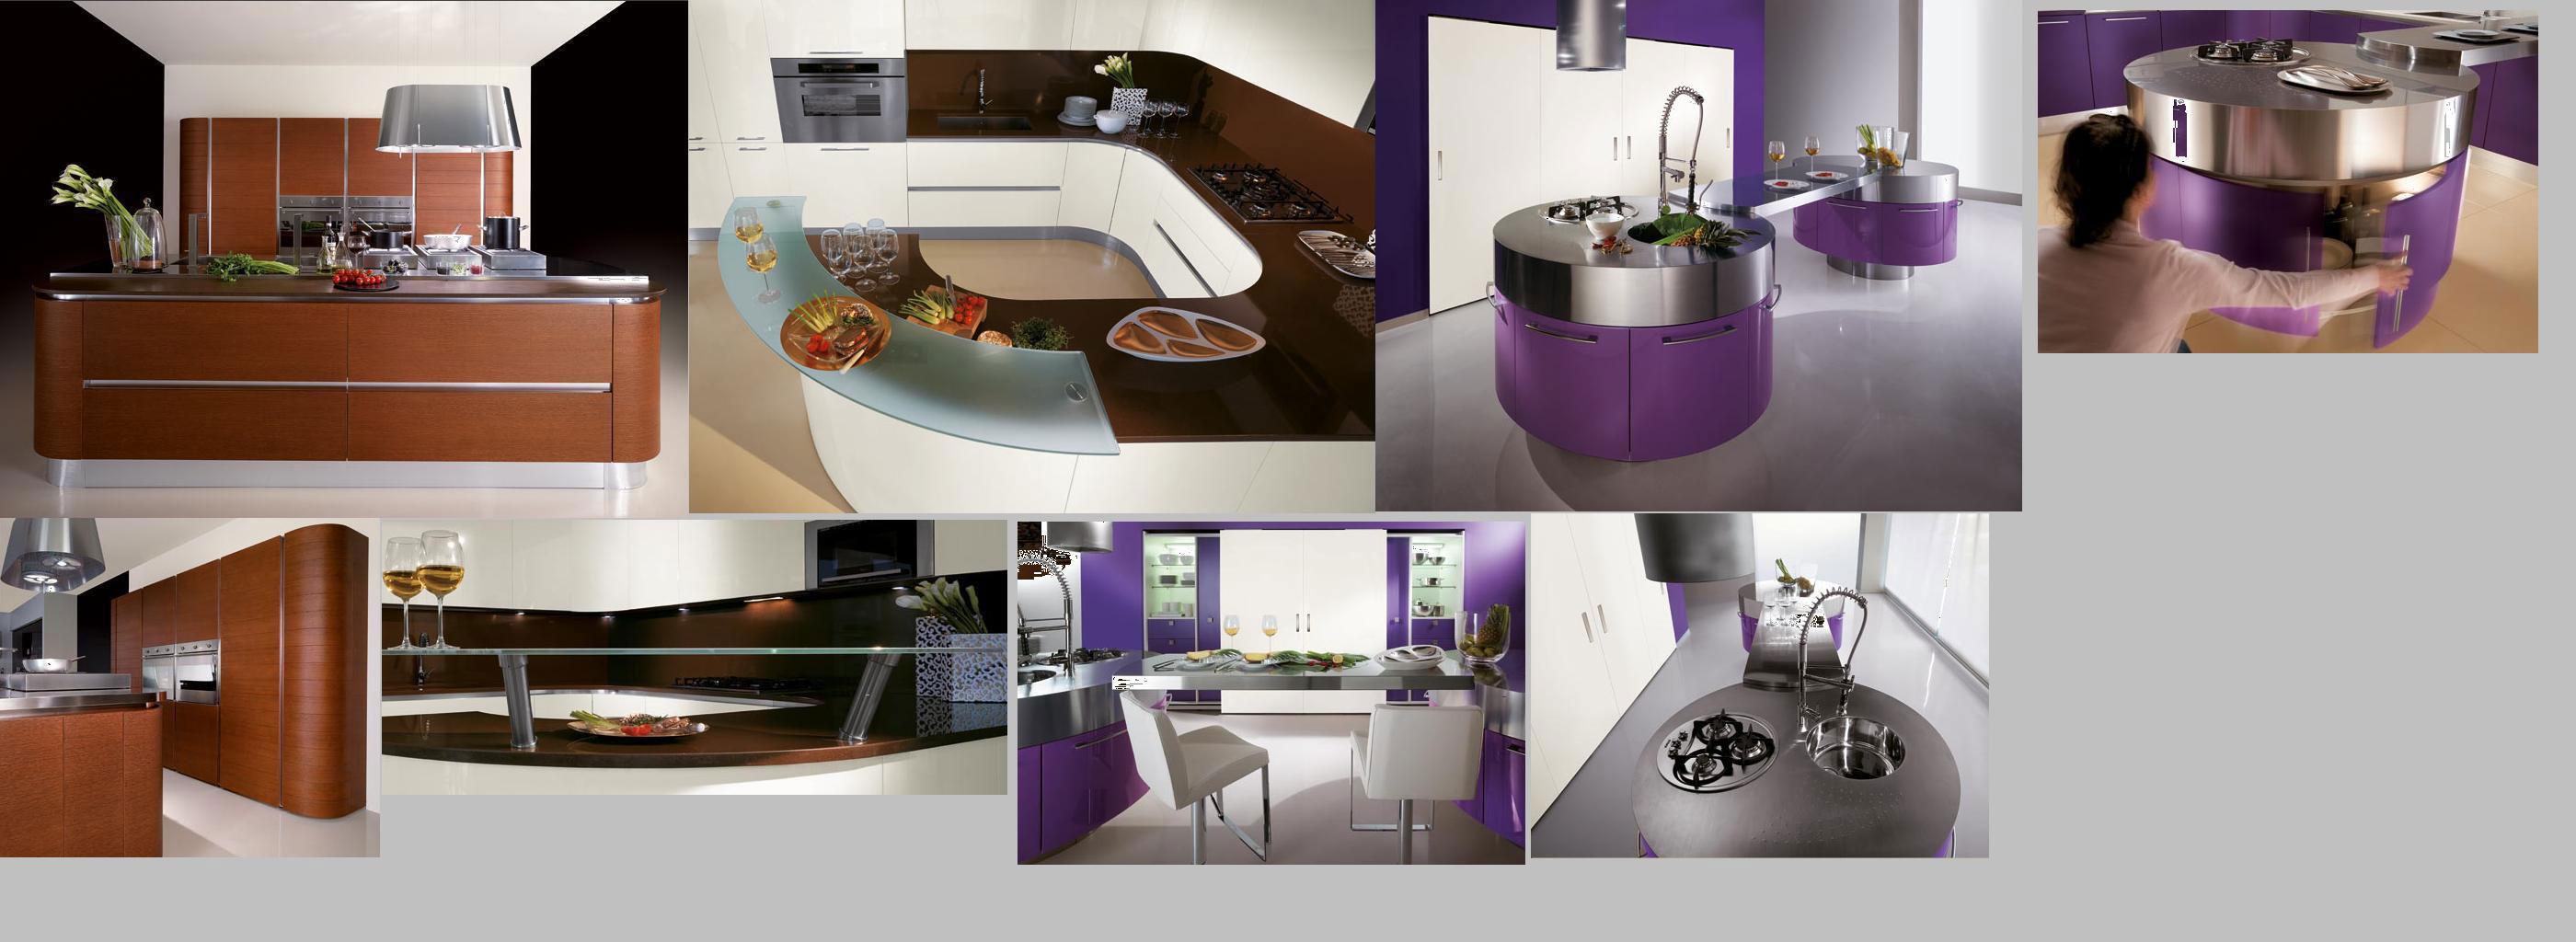 Cuisine design de luxe - Cuisine de luxe design ...